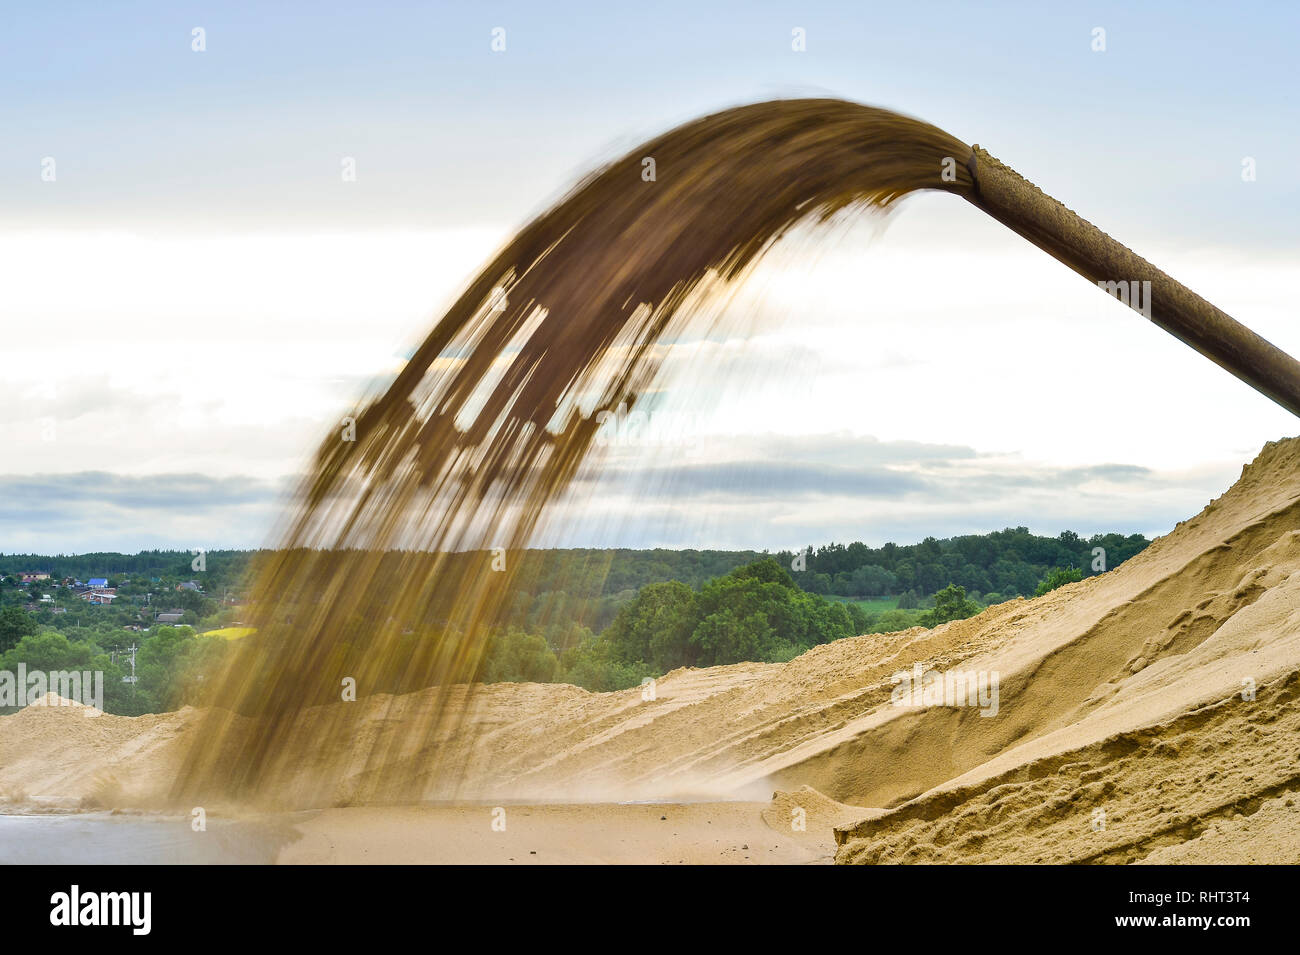 industrial applications of liquid liquid extraction